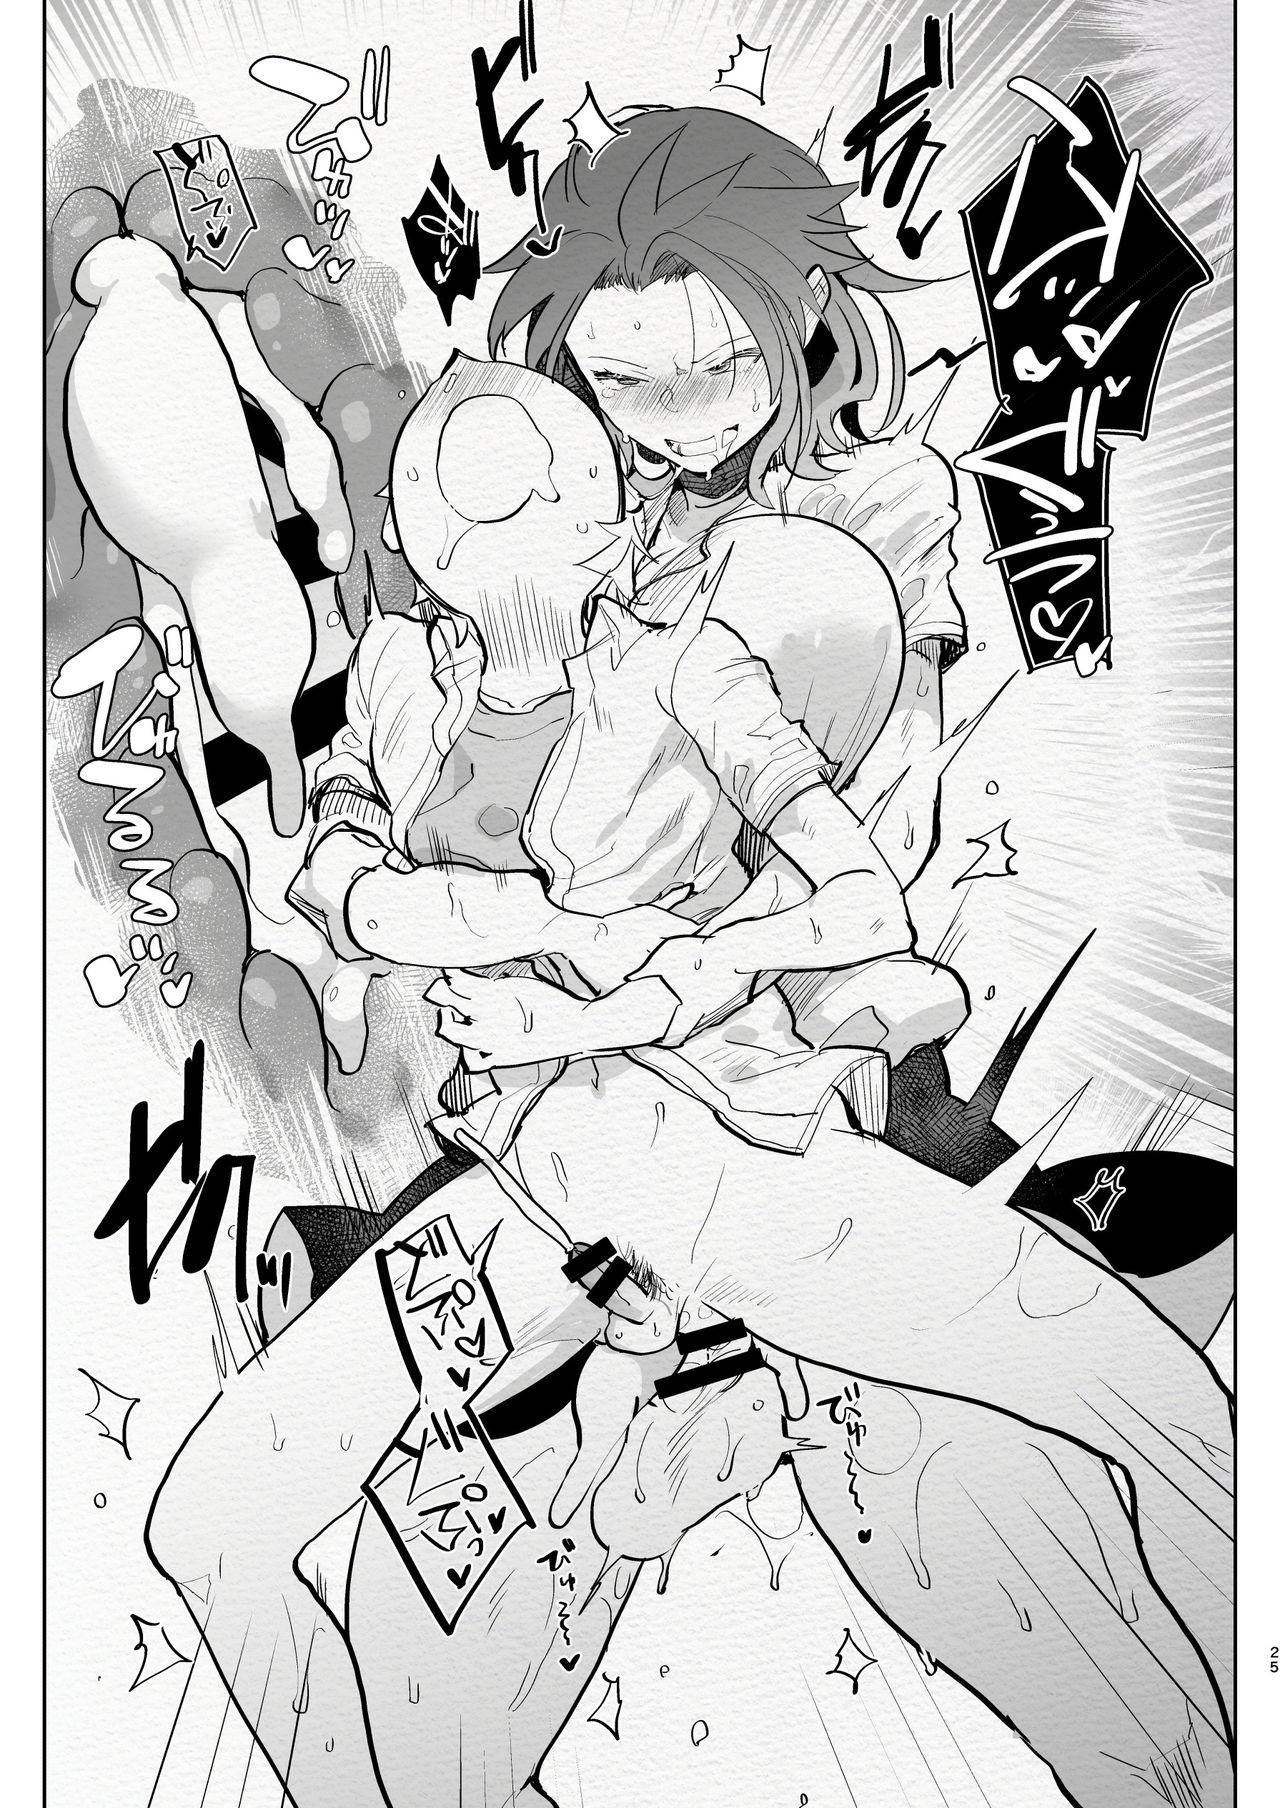 Futanari Osananajimi to Ore to Hajimete no Gyaku Anal Kagai Jugyou 丨扶她青梅竹馬和我第一次的反向小穴做愛課外授課 25